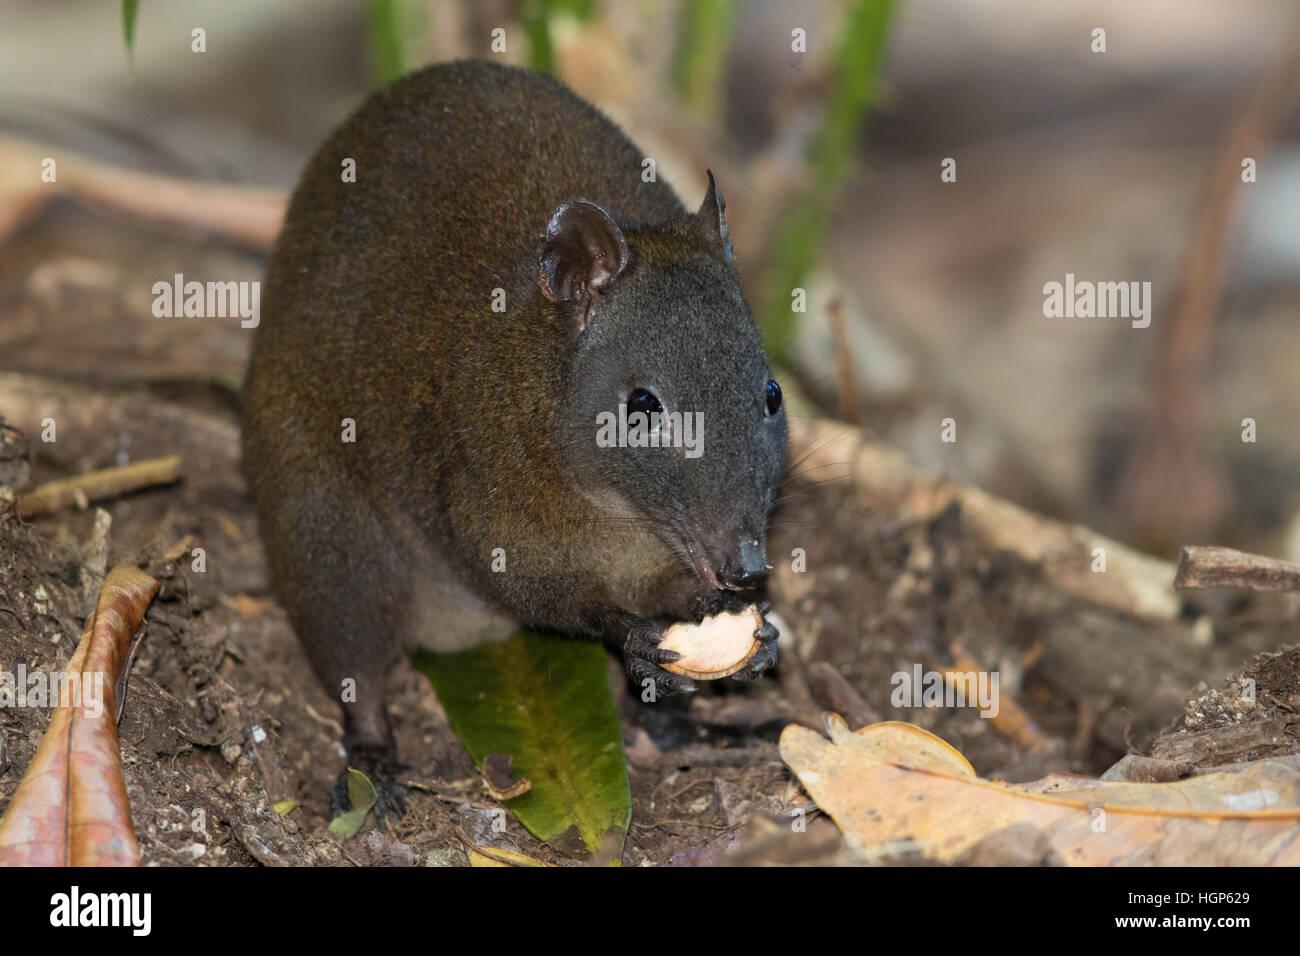 Muschiato Ratto canguro (Hypsiprymnodon moschatus) Immagini Stock